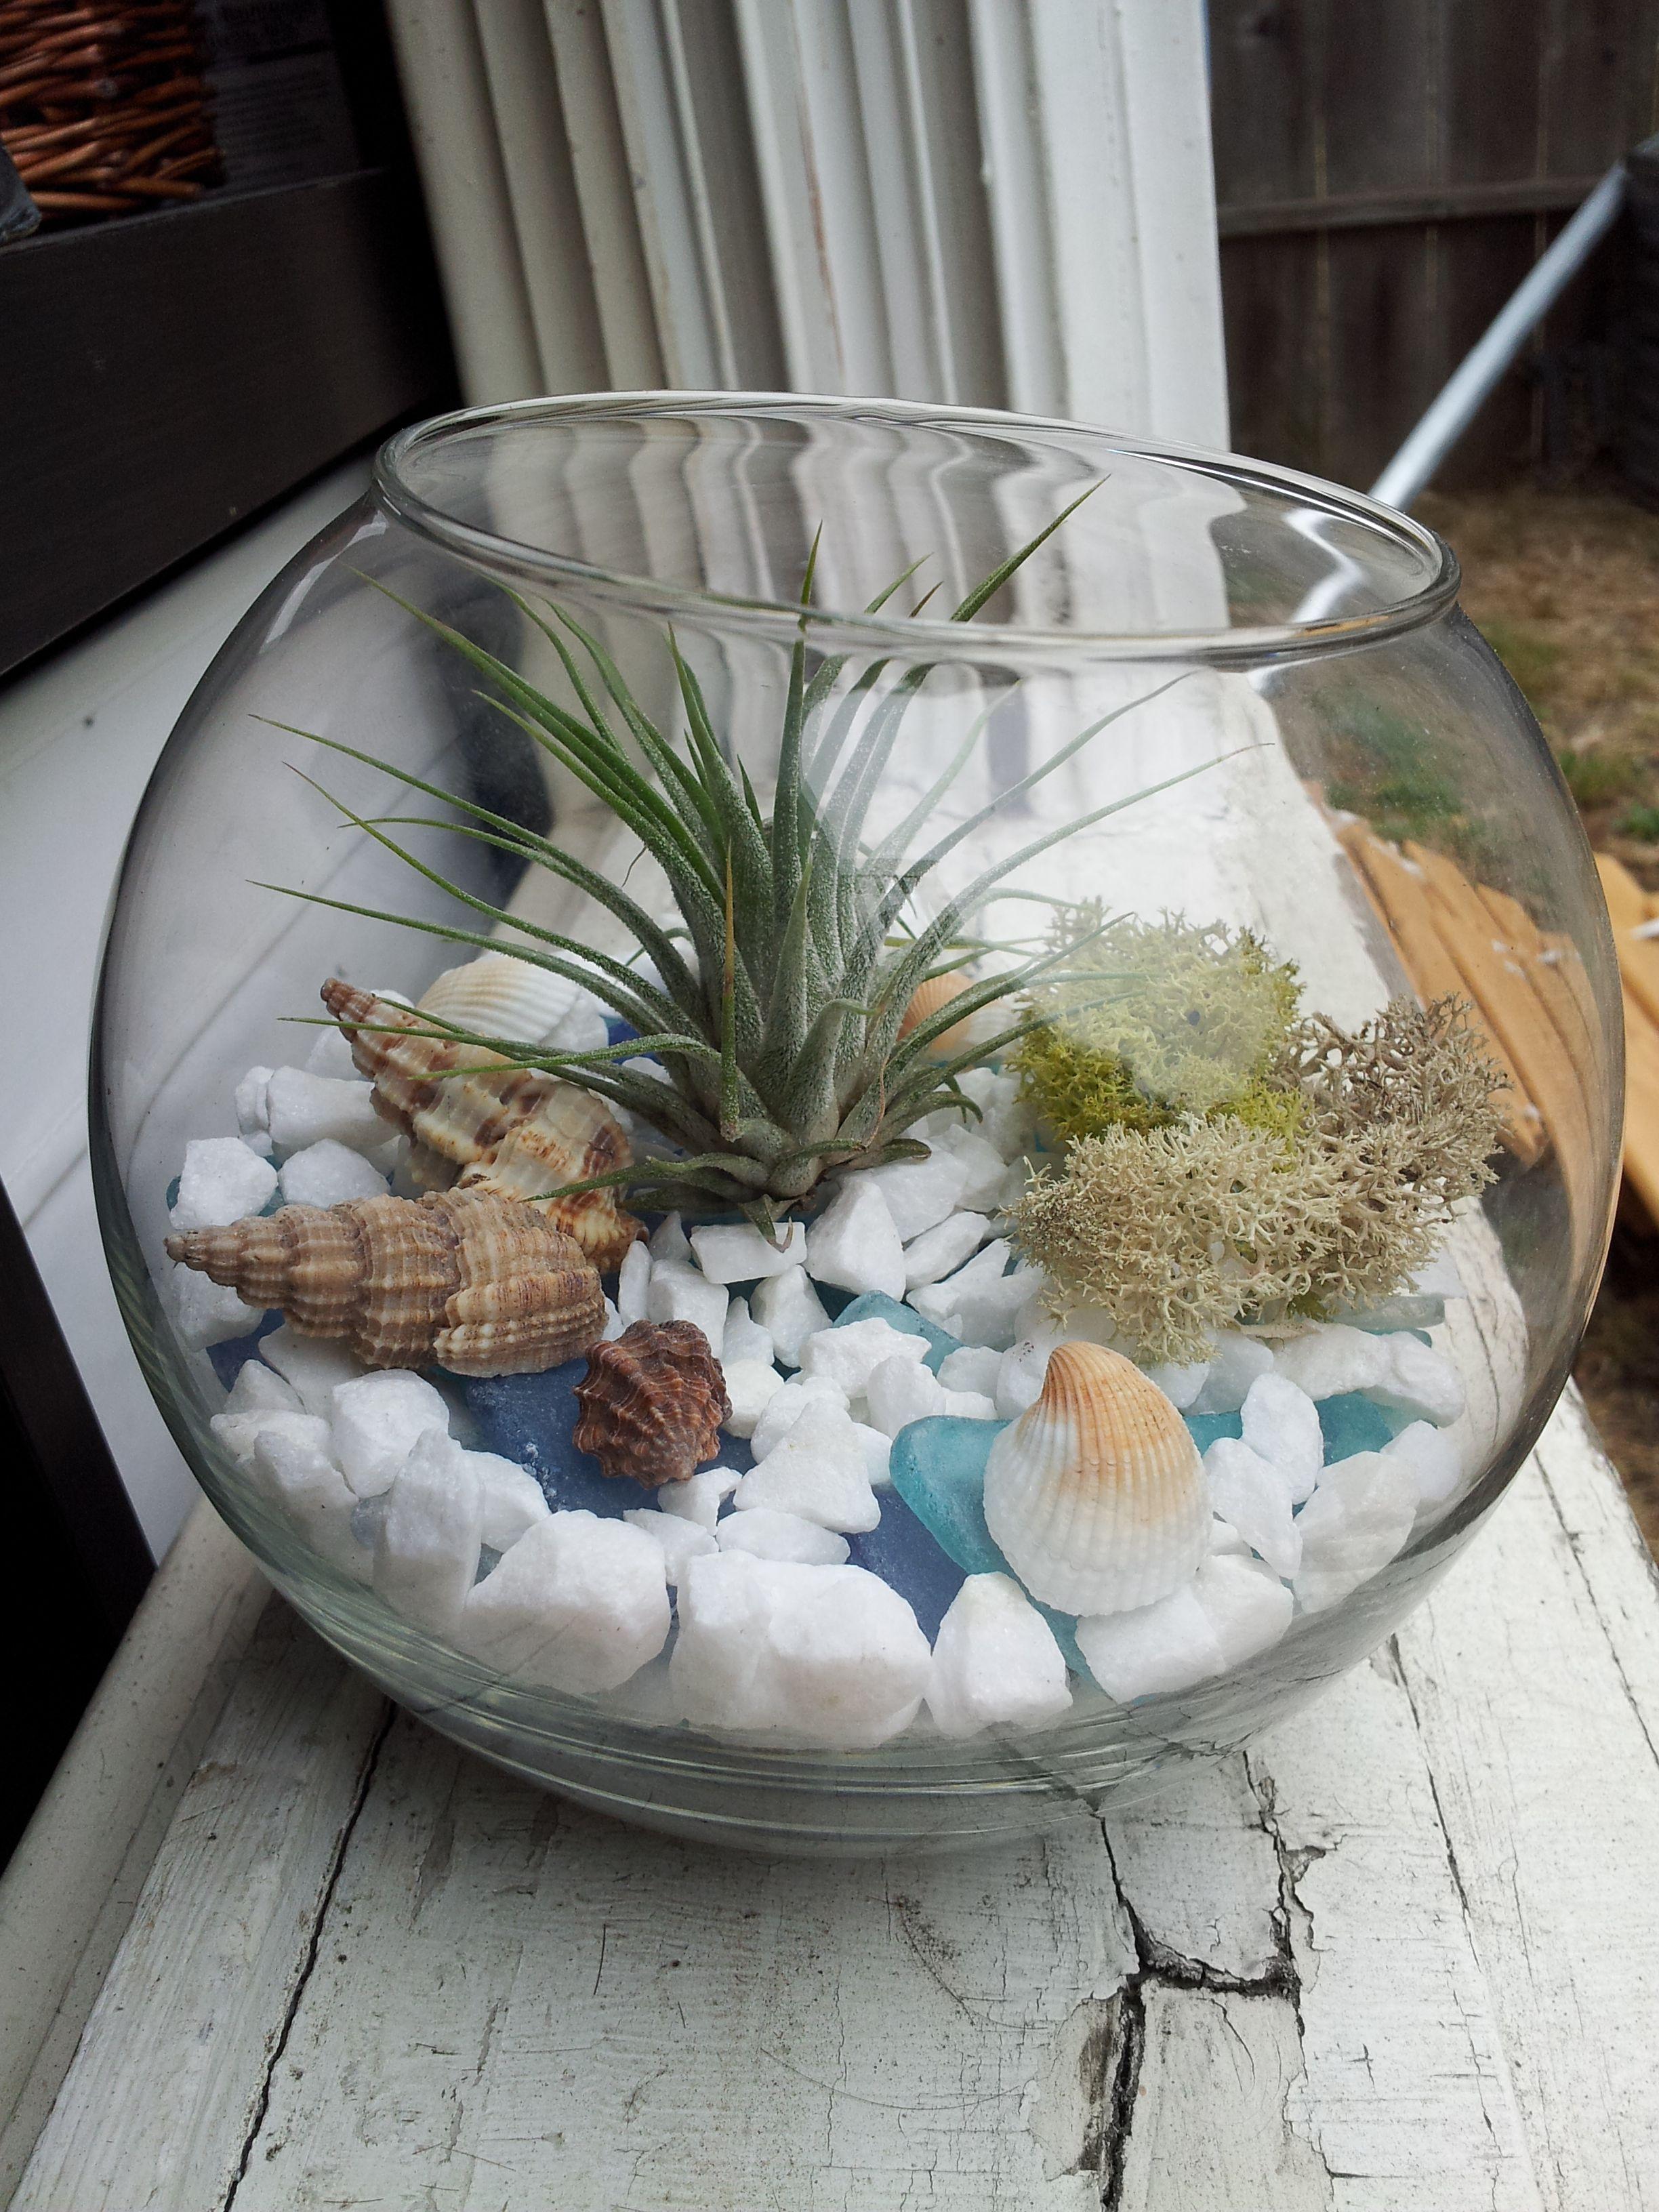 Tillandsia (air plant) terrarium with sea glass, stones